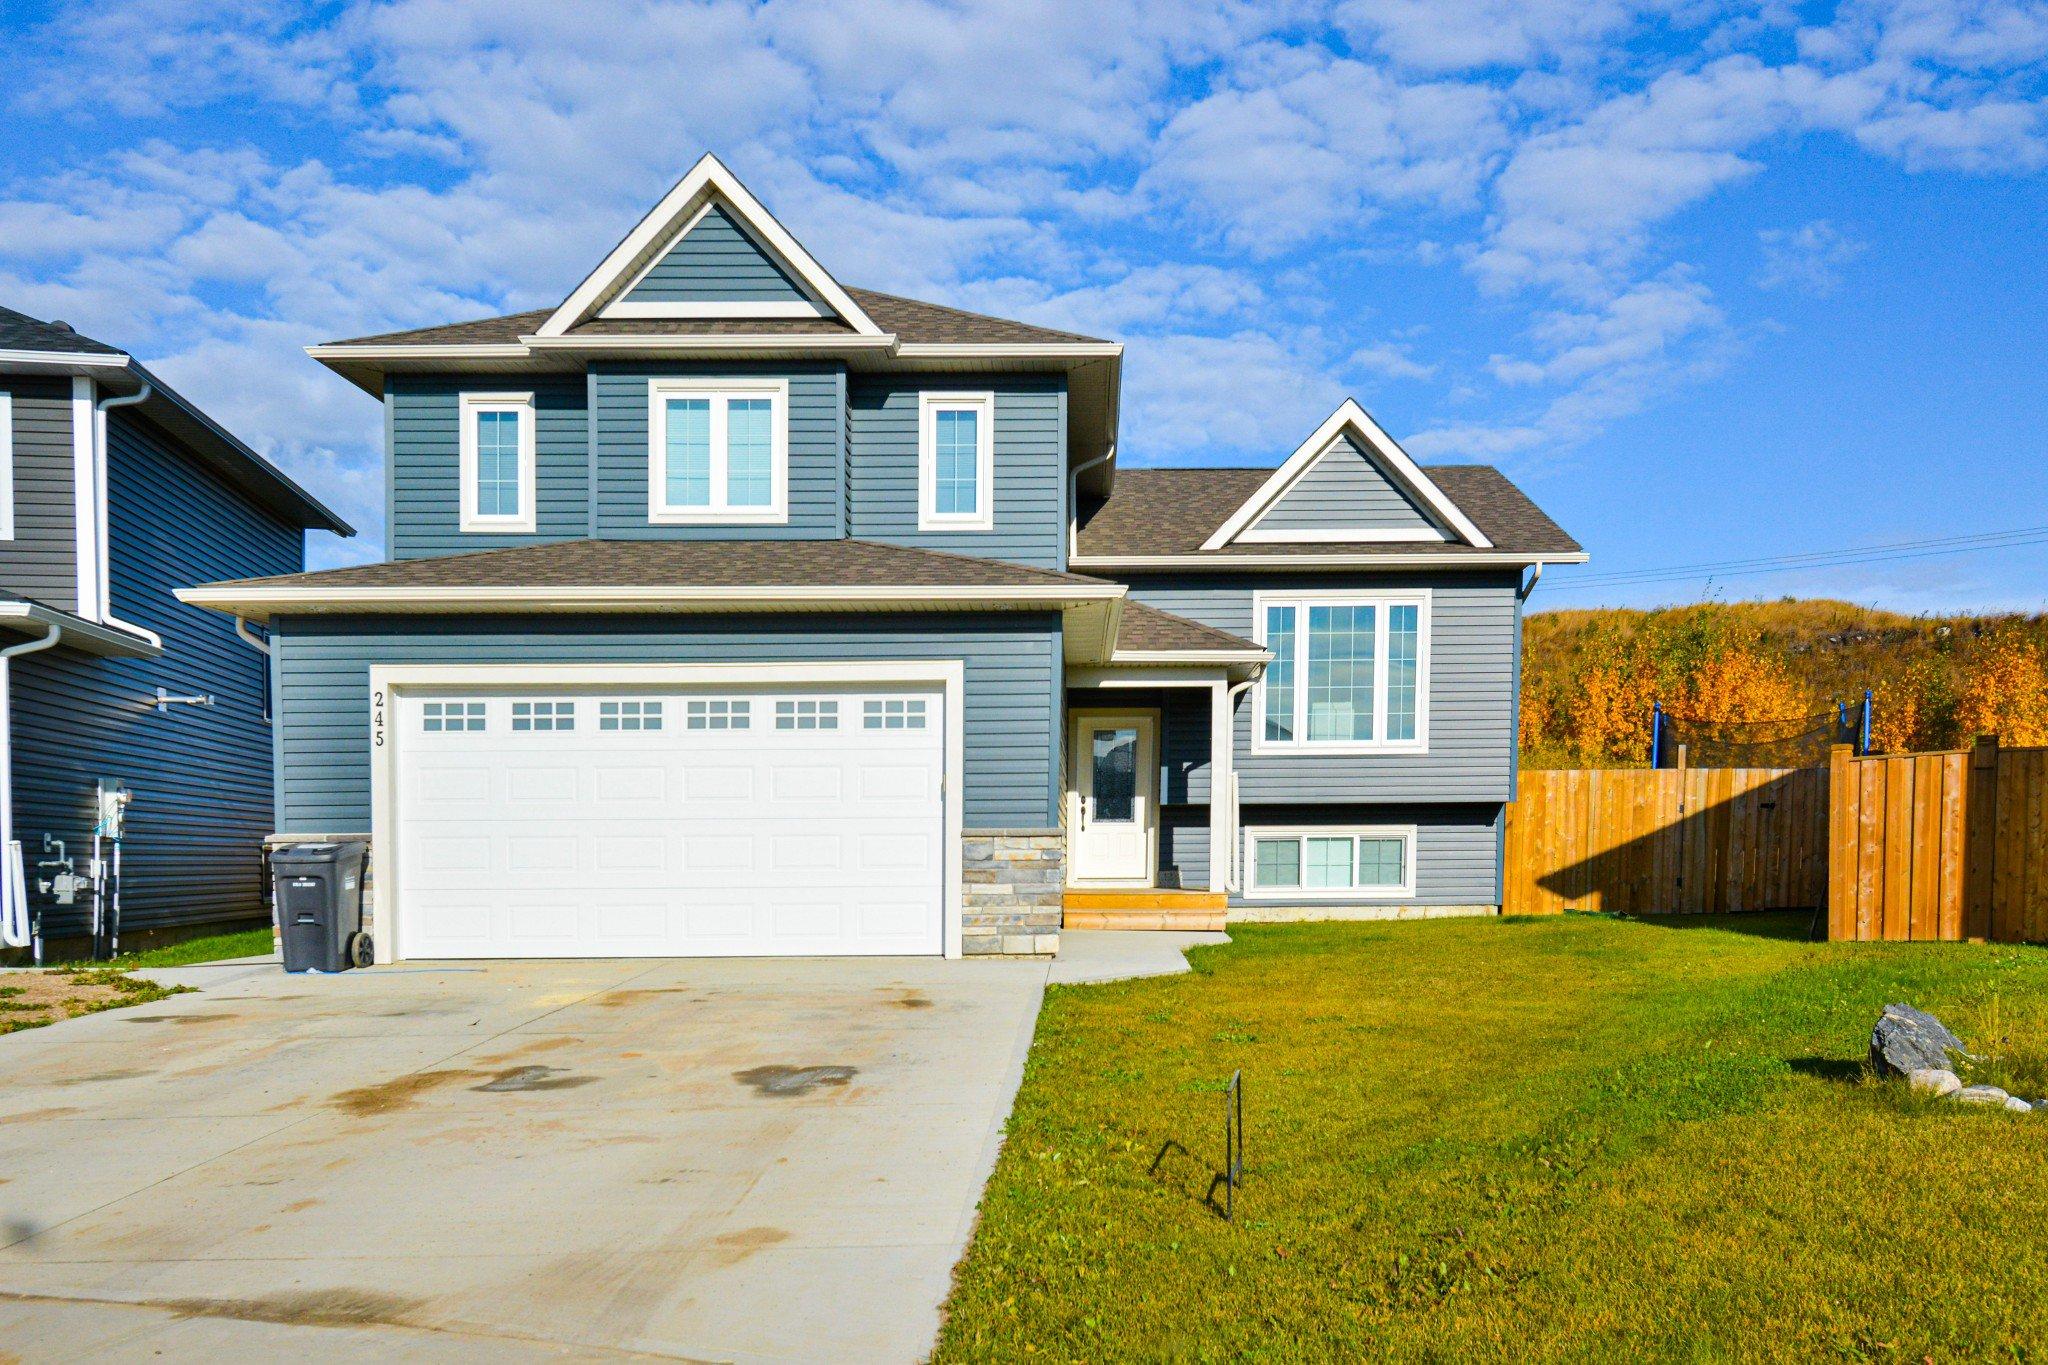 Main Photo: 245 Terra Nova Crescent SE: Cold Lake House for sale : MLS®# E4215244